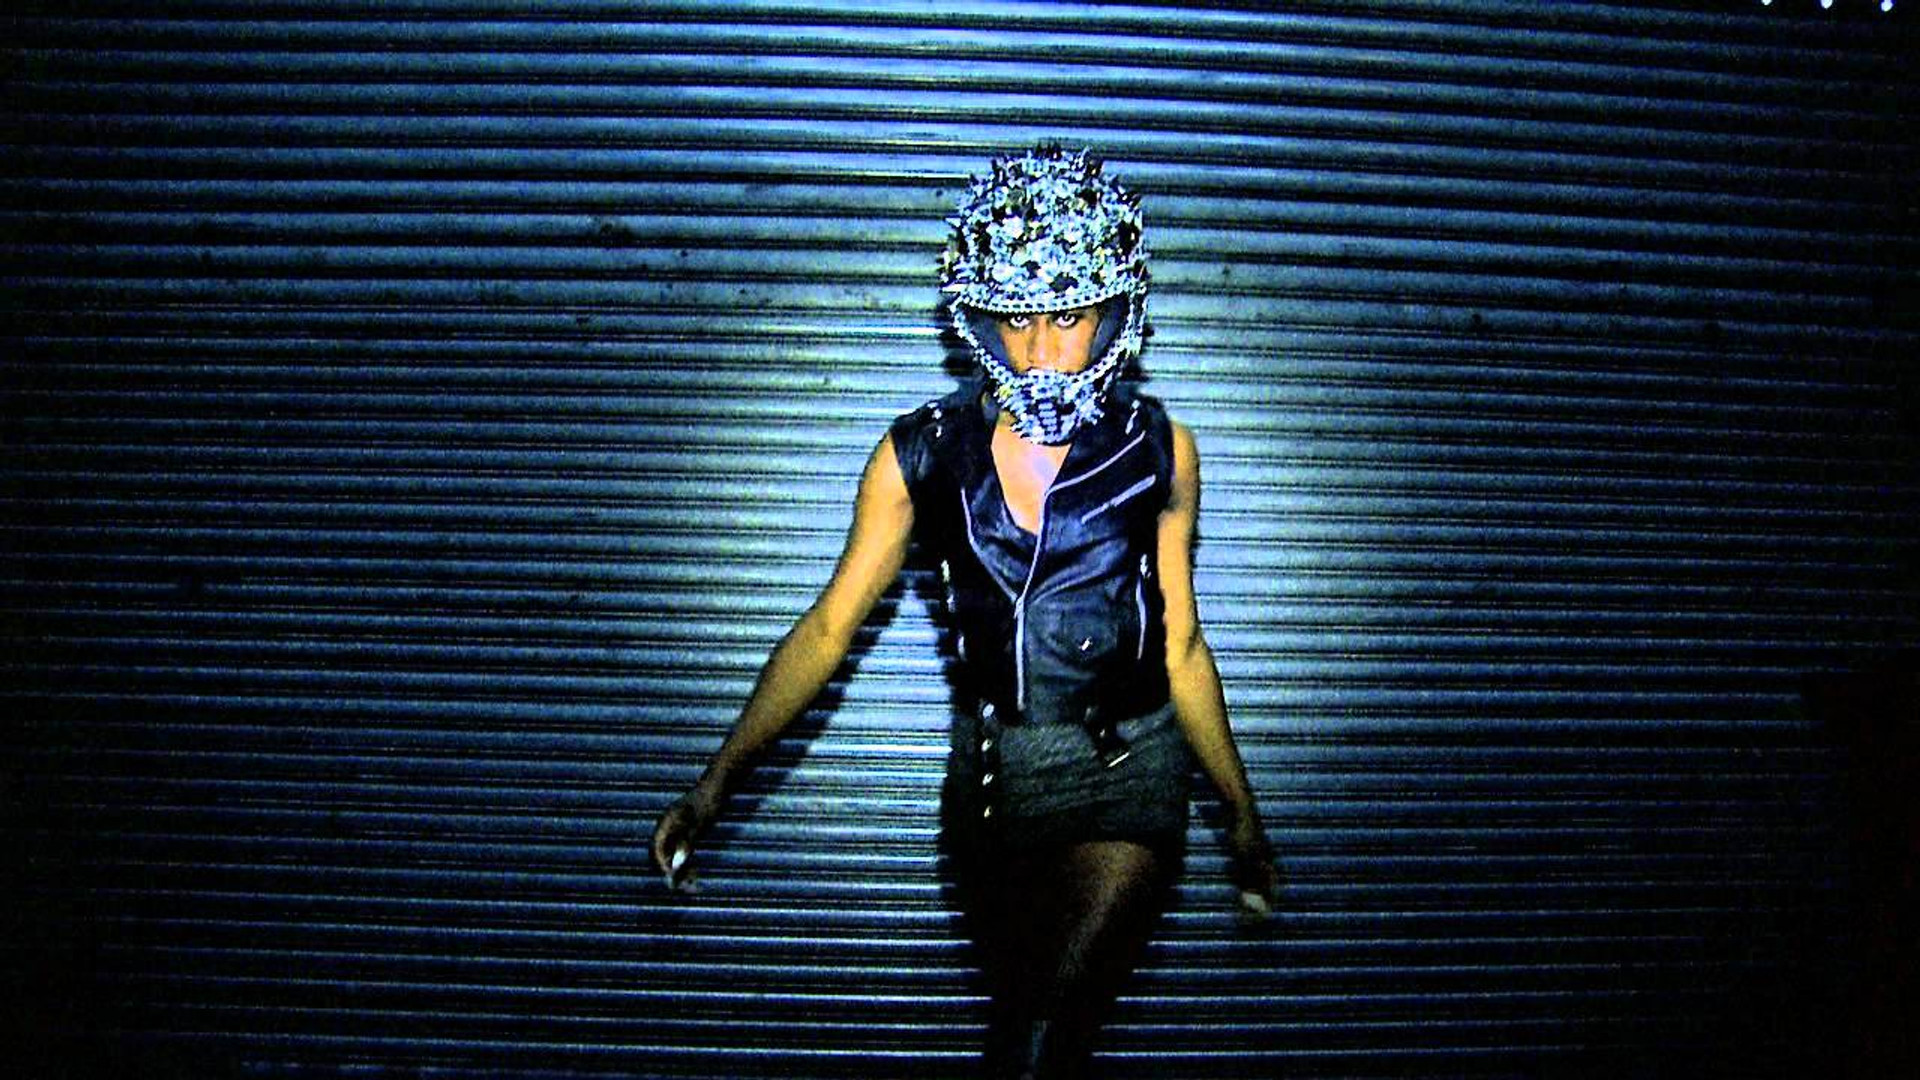 Warrior - Official Music Video